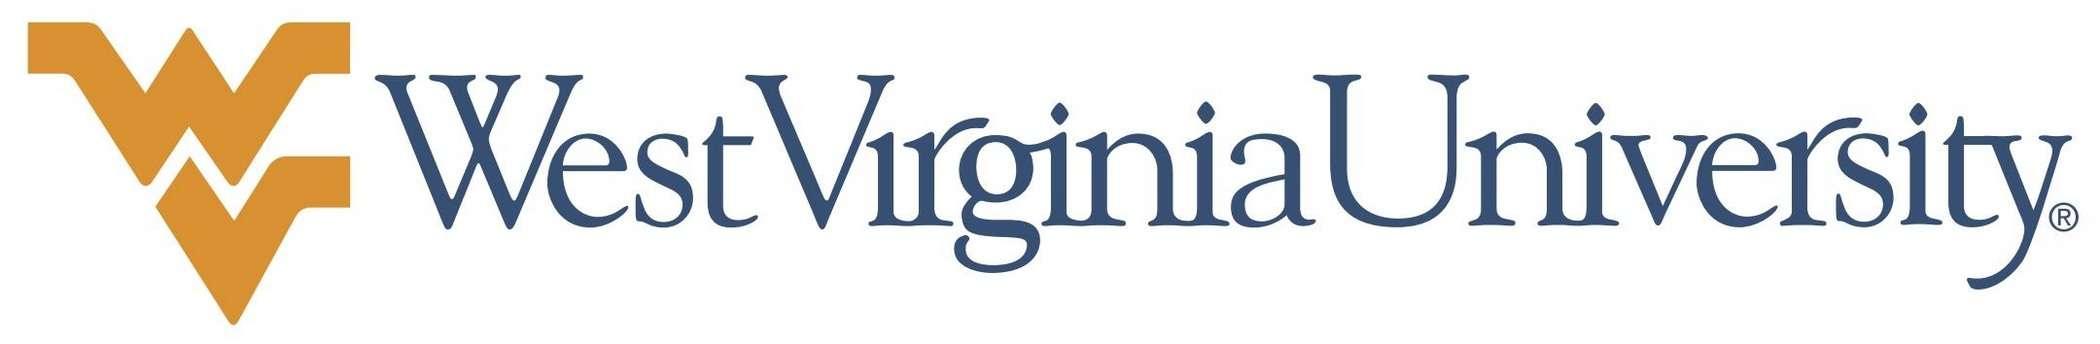 West-Virginia-University-WVU-Logo